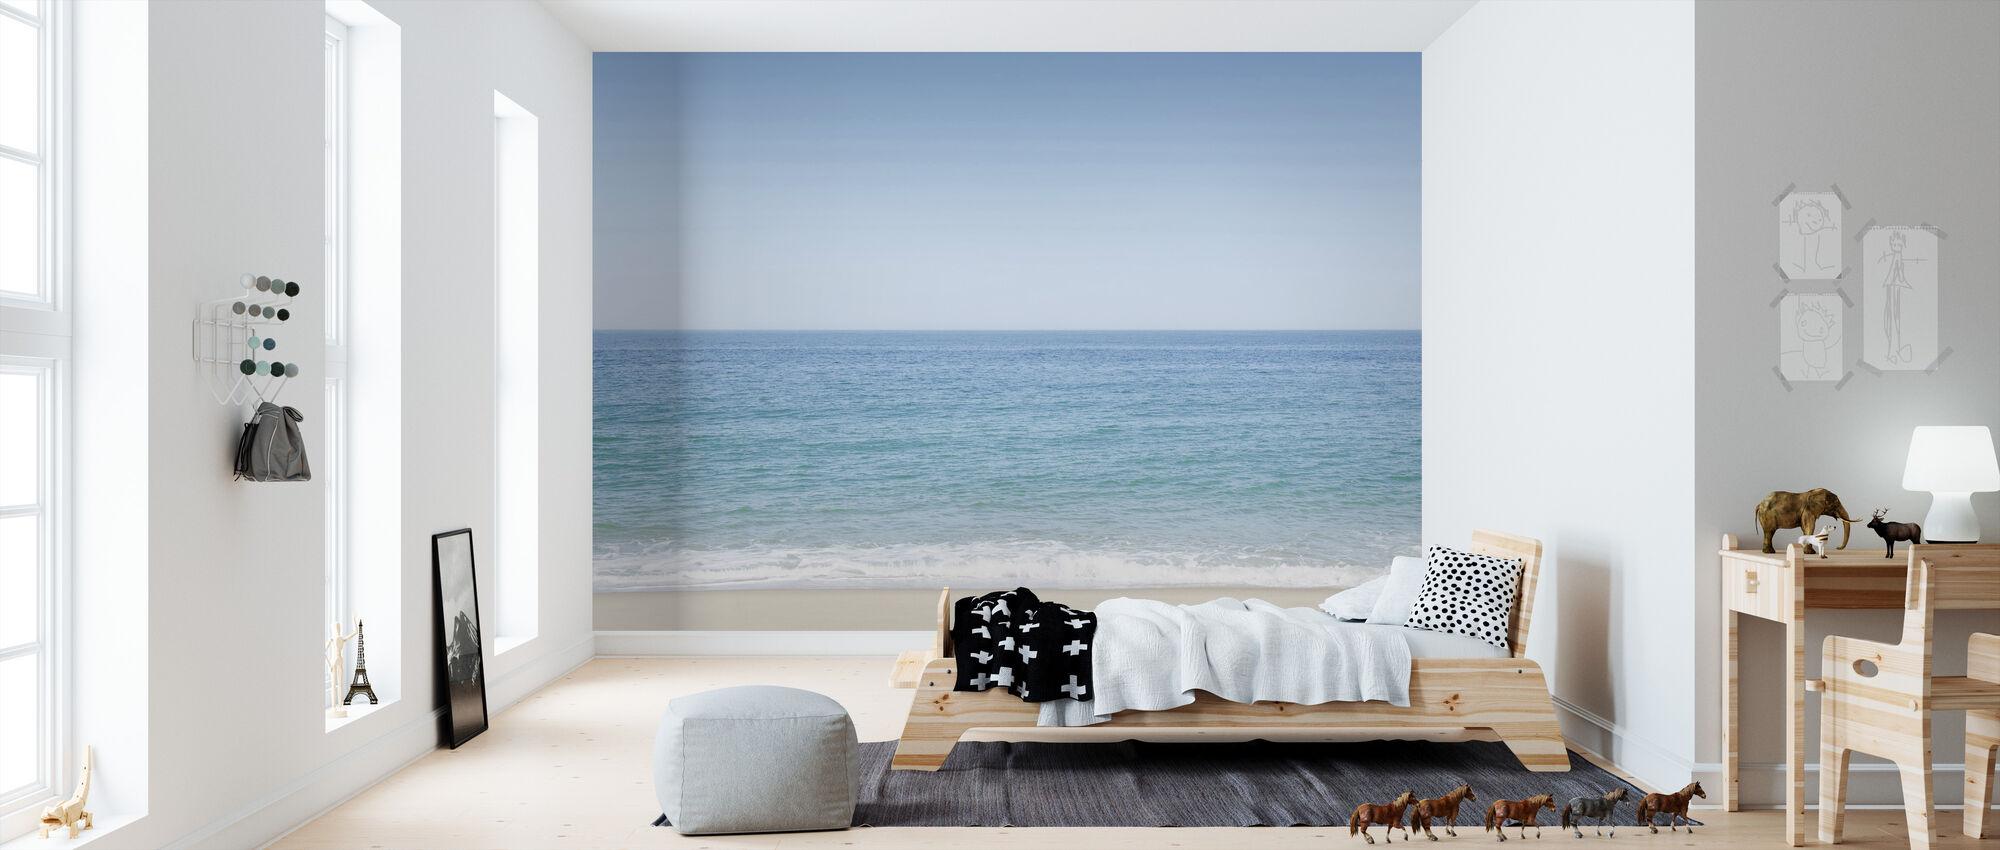 Tied to the Ocean - Wallpaper - Kids Room